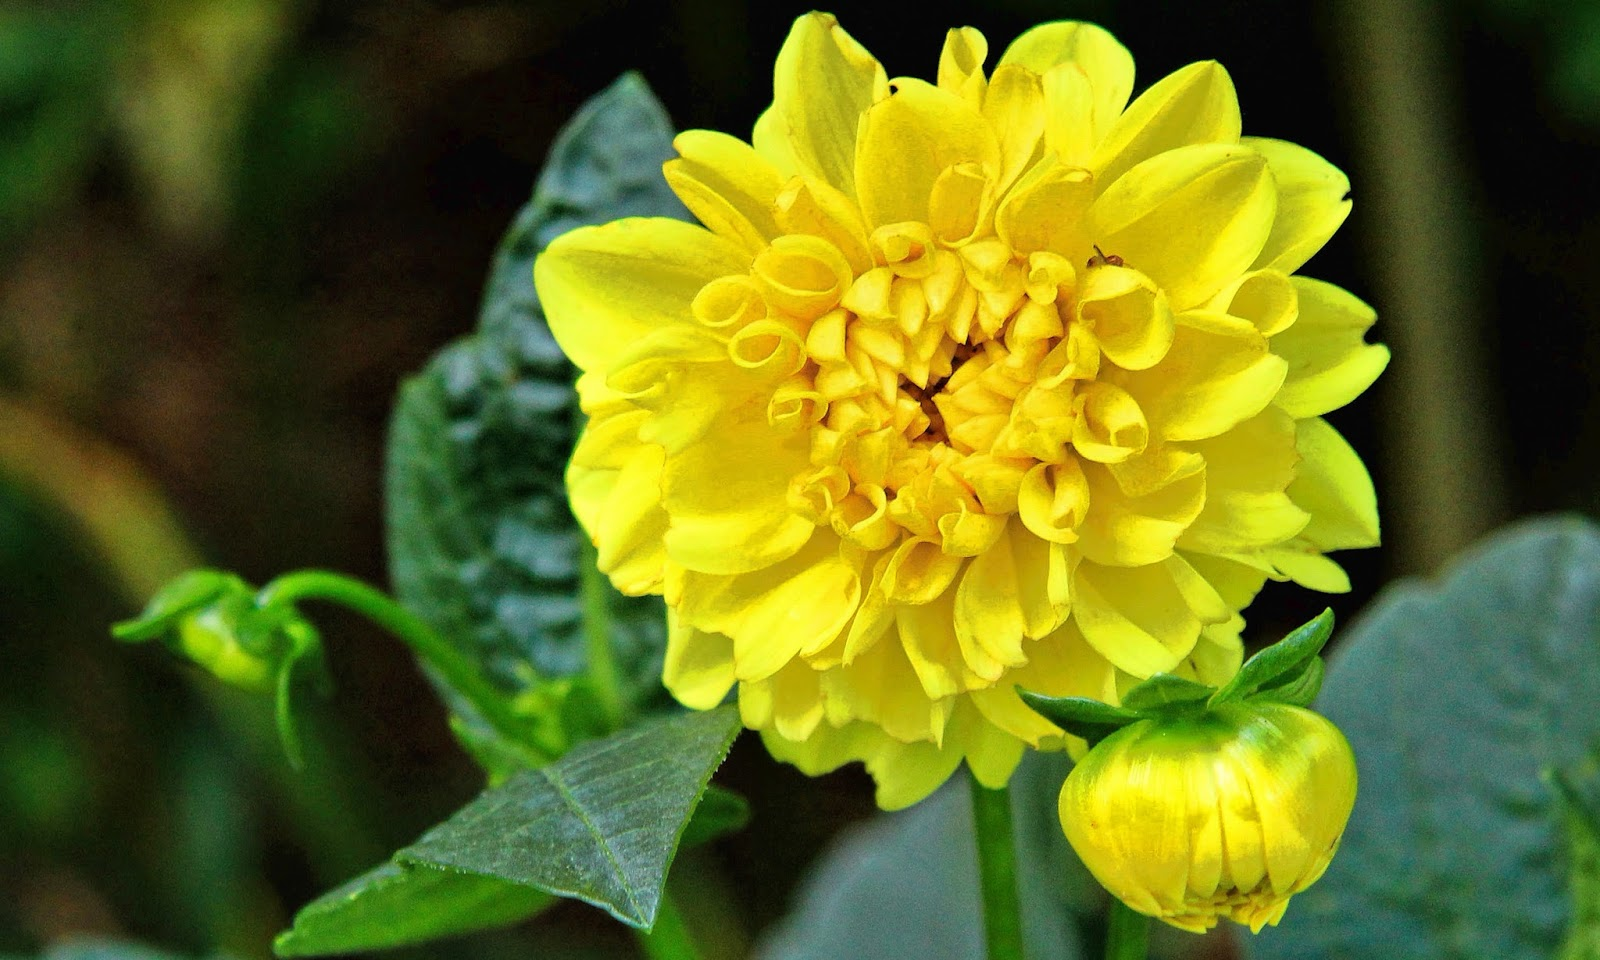 Dahlia Flower HD Wallpapers HD Wallpapers High Definition